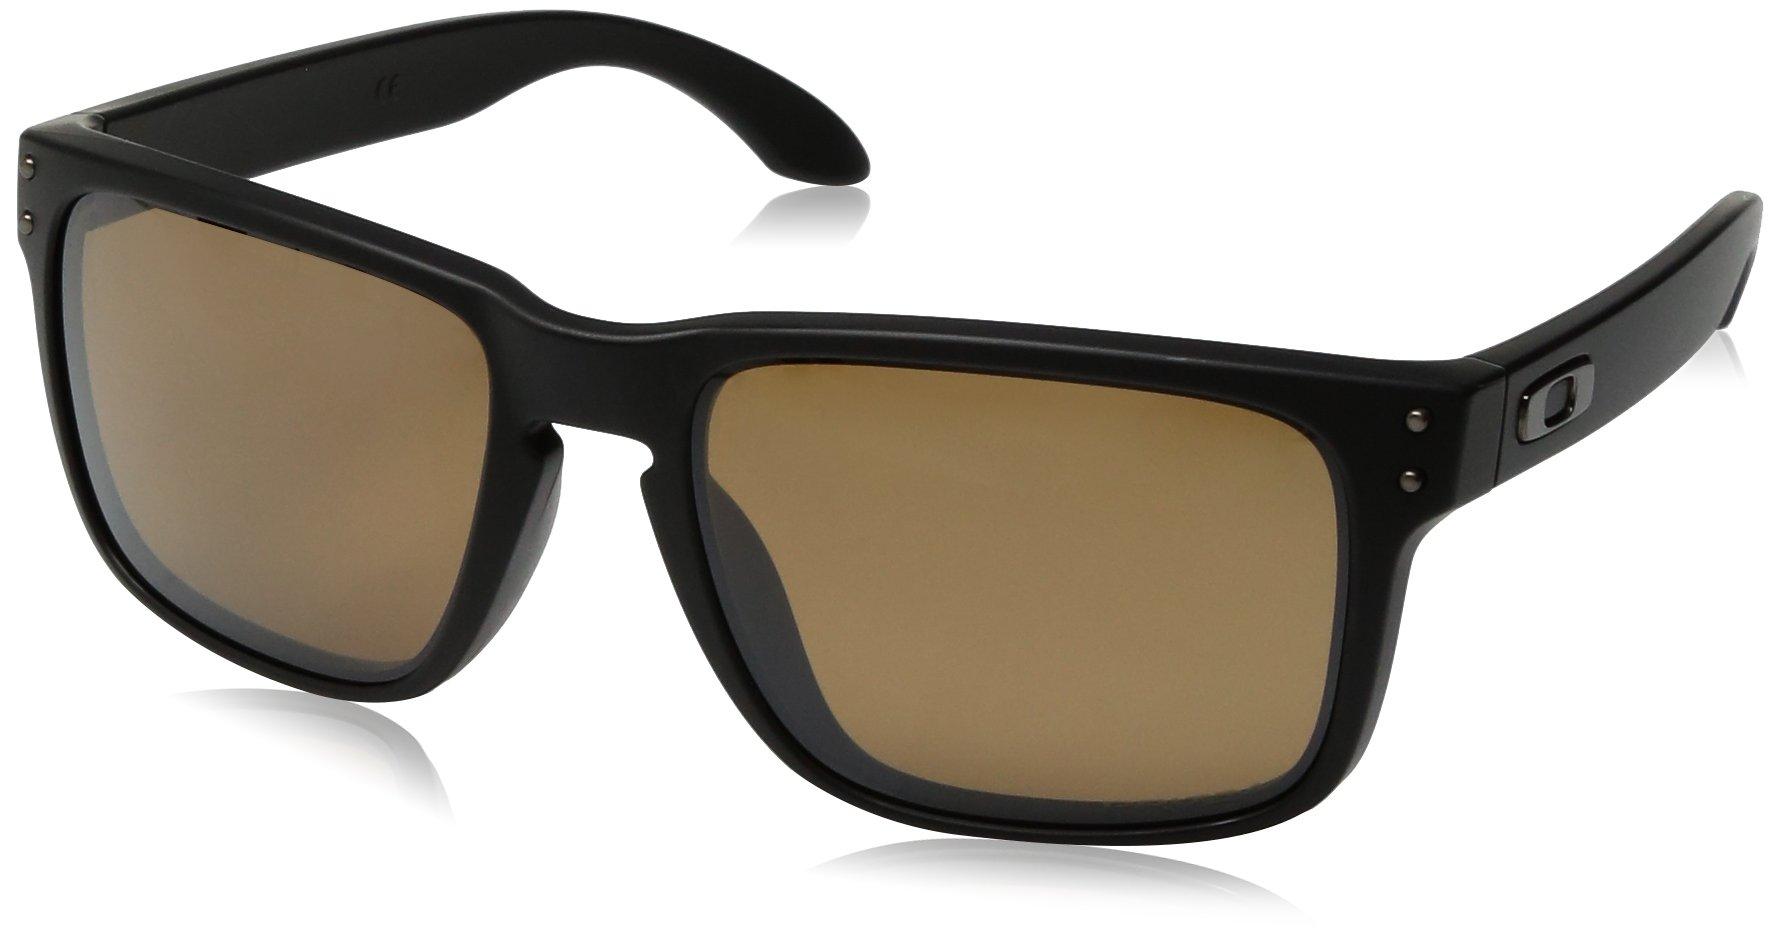 Oakley Holbrook Sunglasses, Matte Black, One Size by Oakley